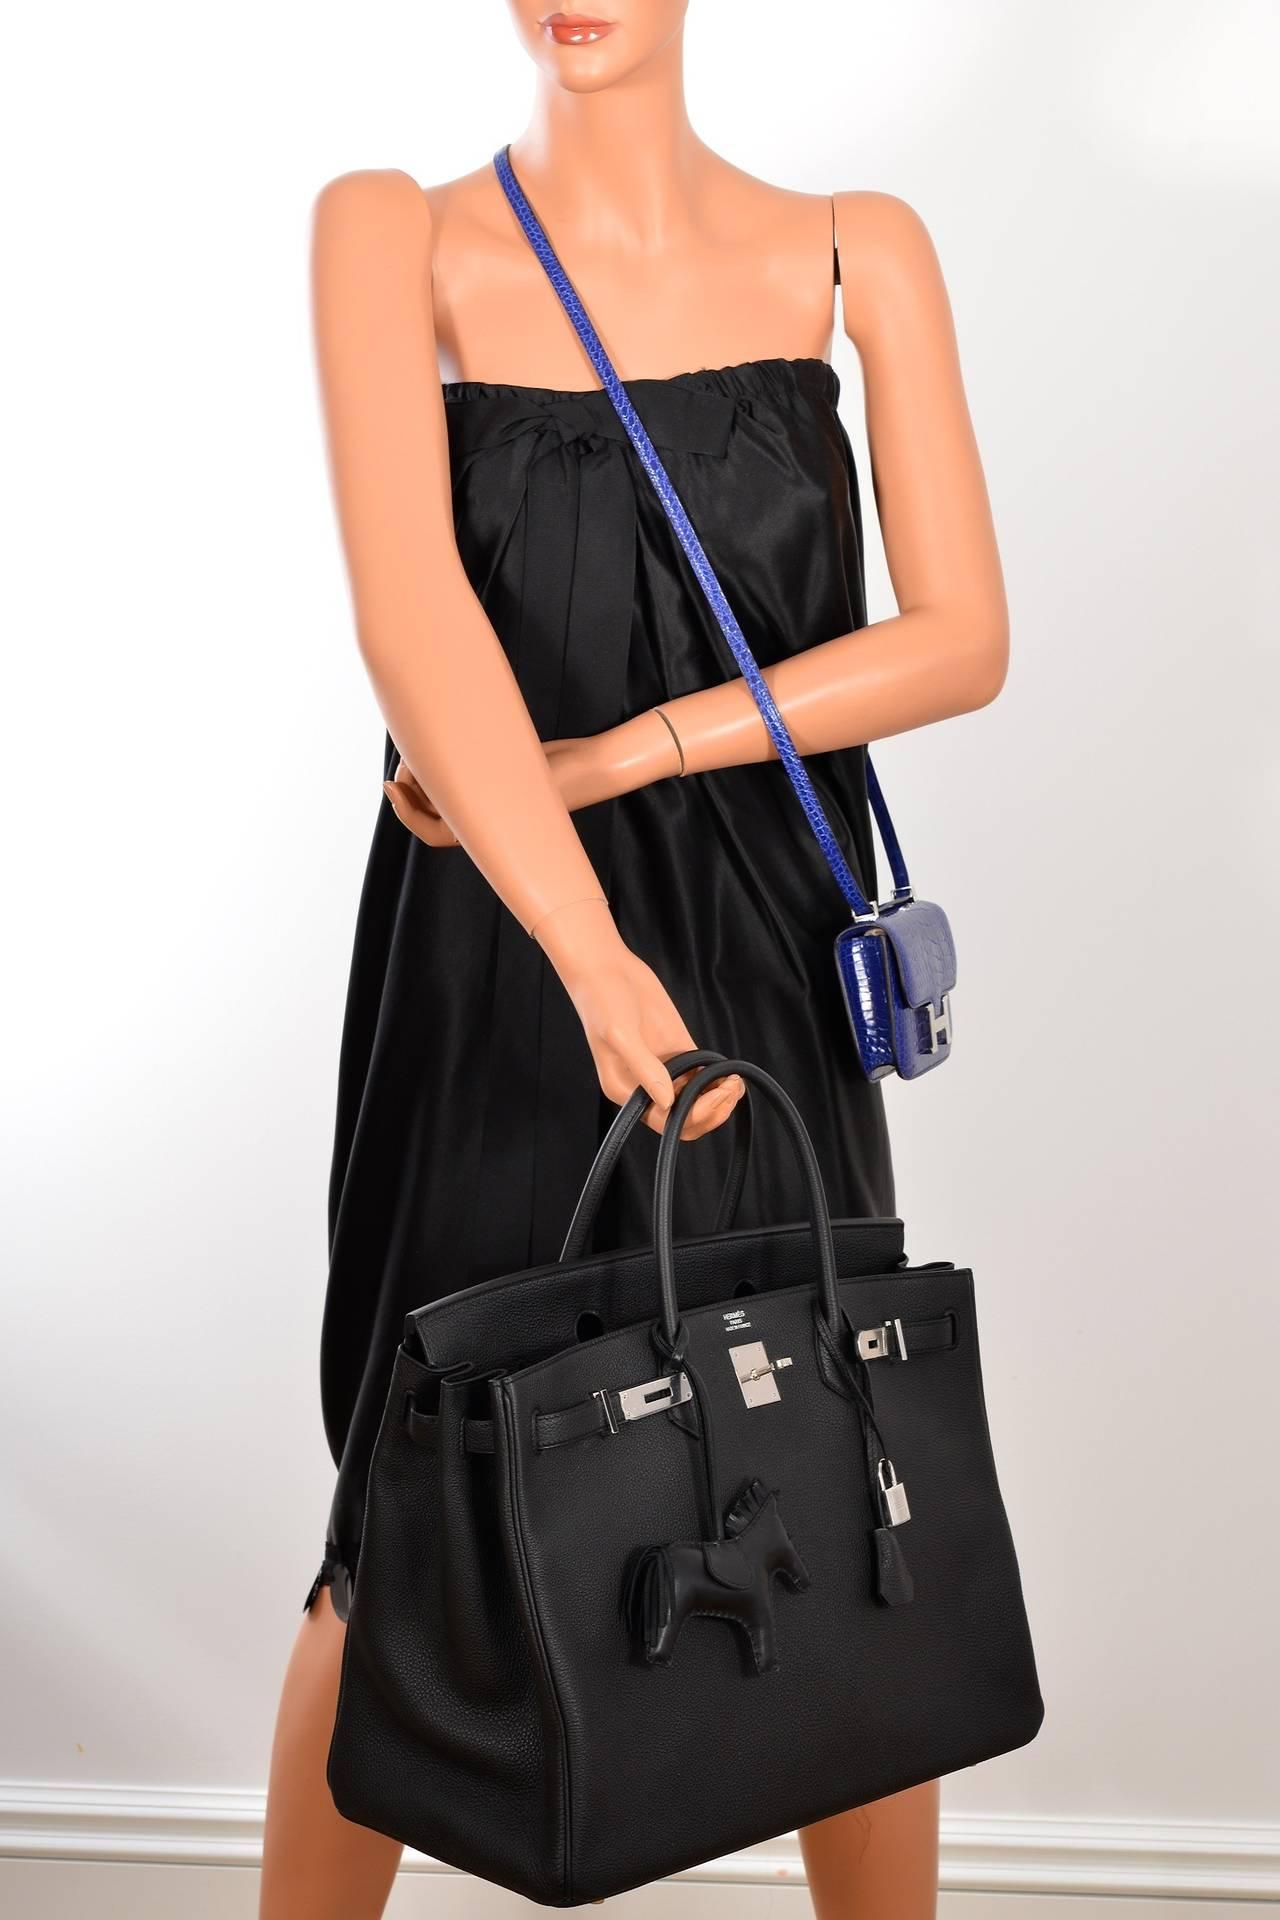 Black Hermes Birkin Bag Hermes Birkin Bag Black 40